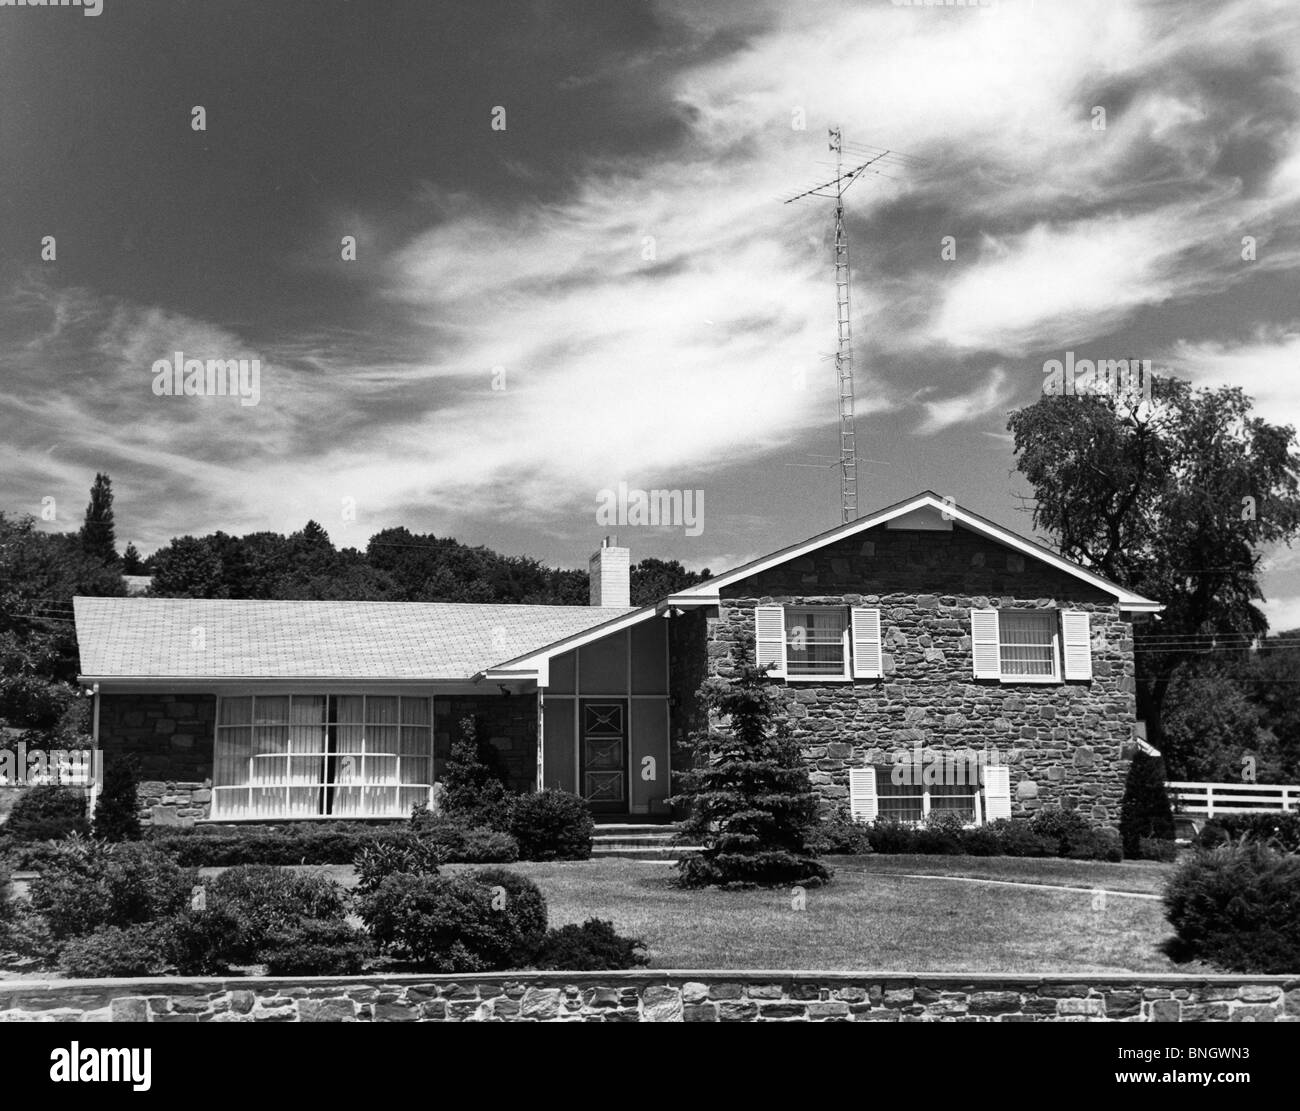 Fassade des Bungalow Haus, 1950er Jahre Stockbild